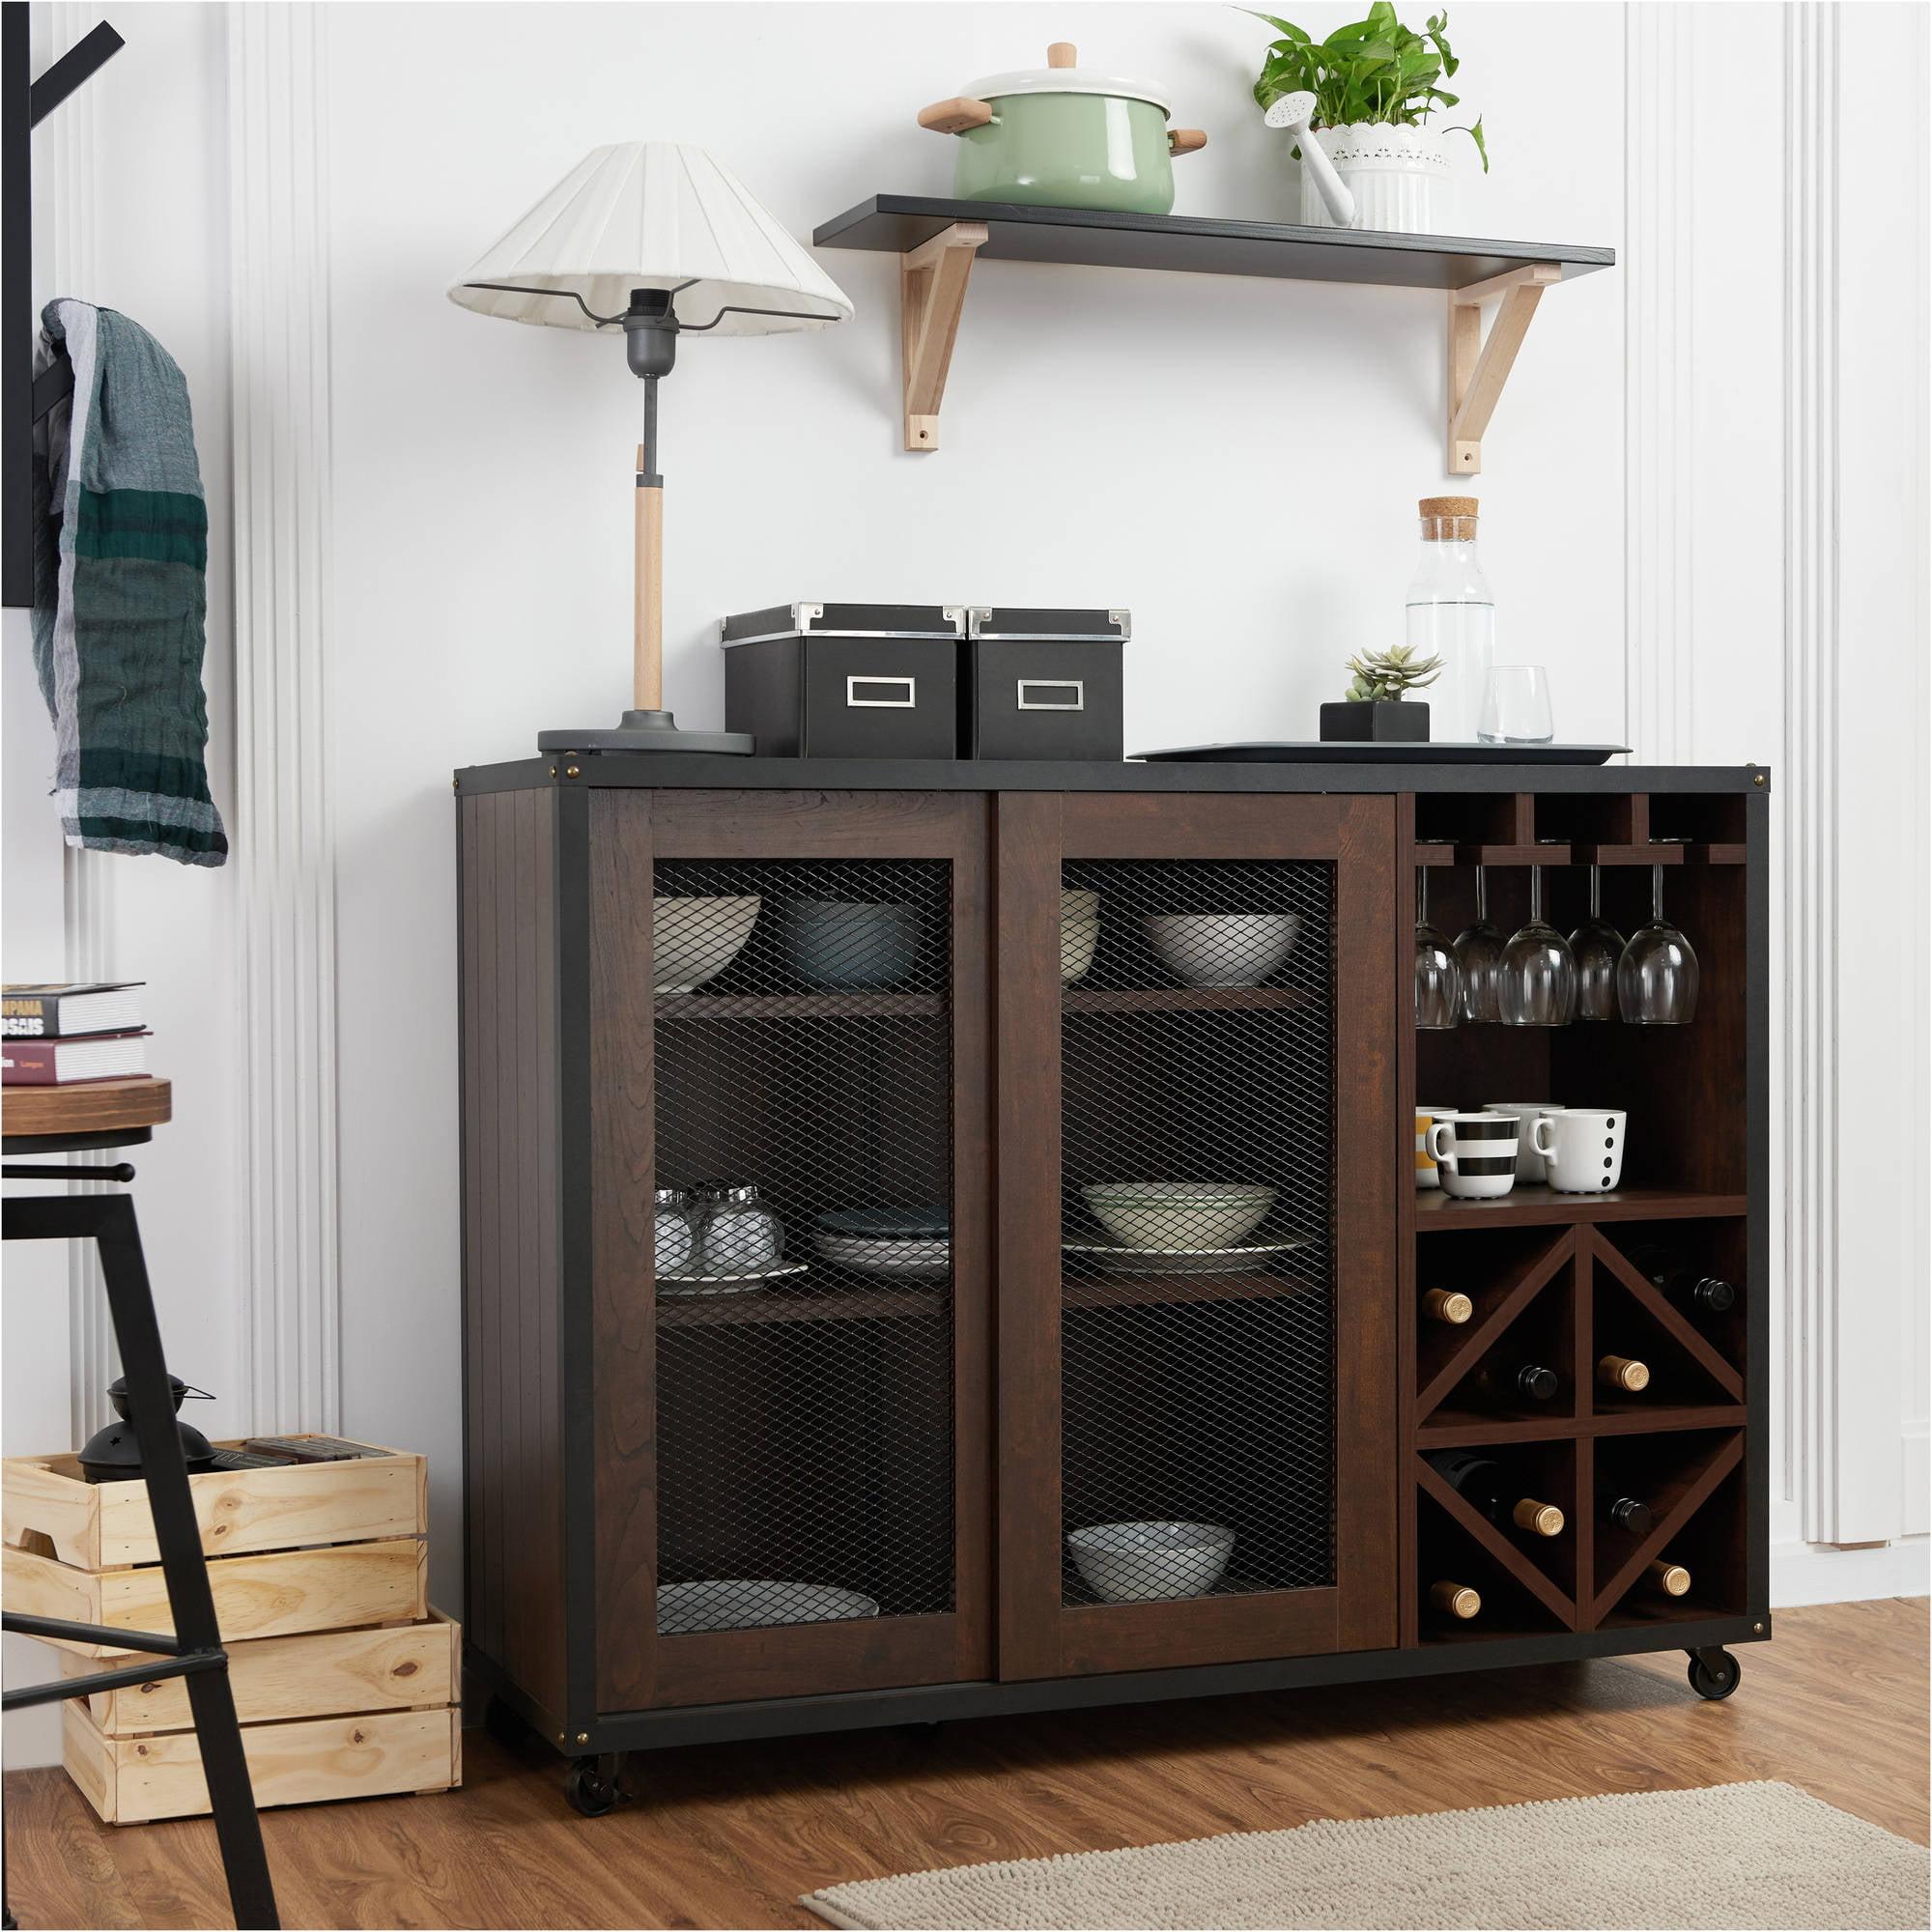 Furniture of America Francis Industrial Multi-Storage Dining Server, Walnut